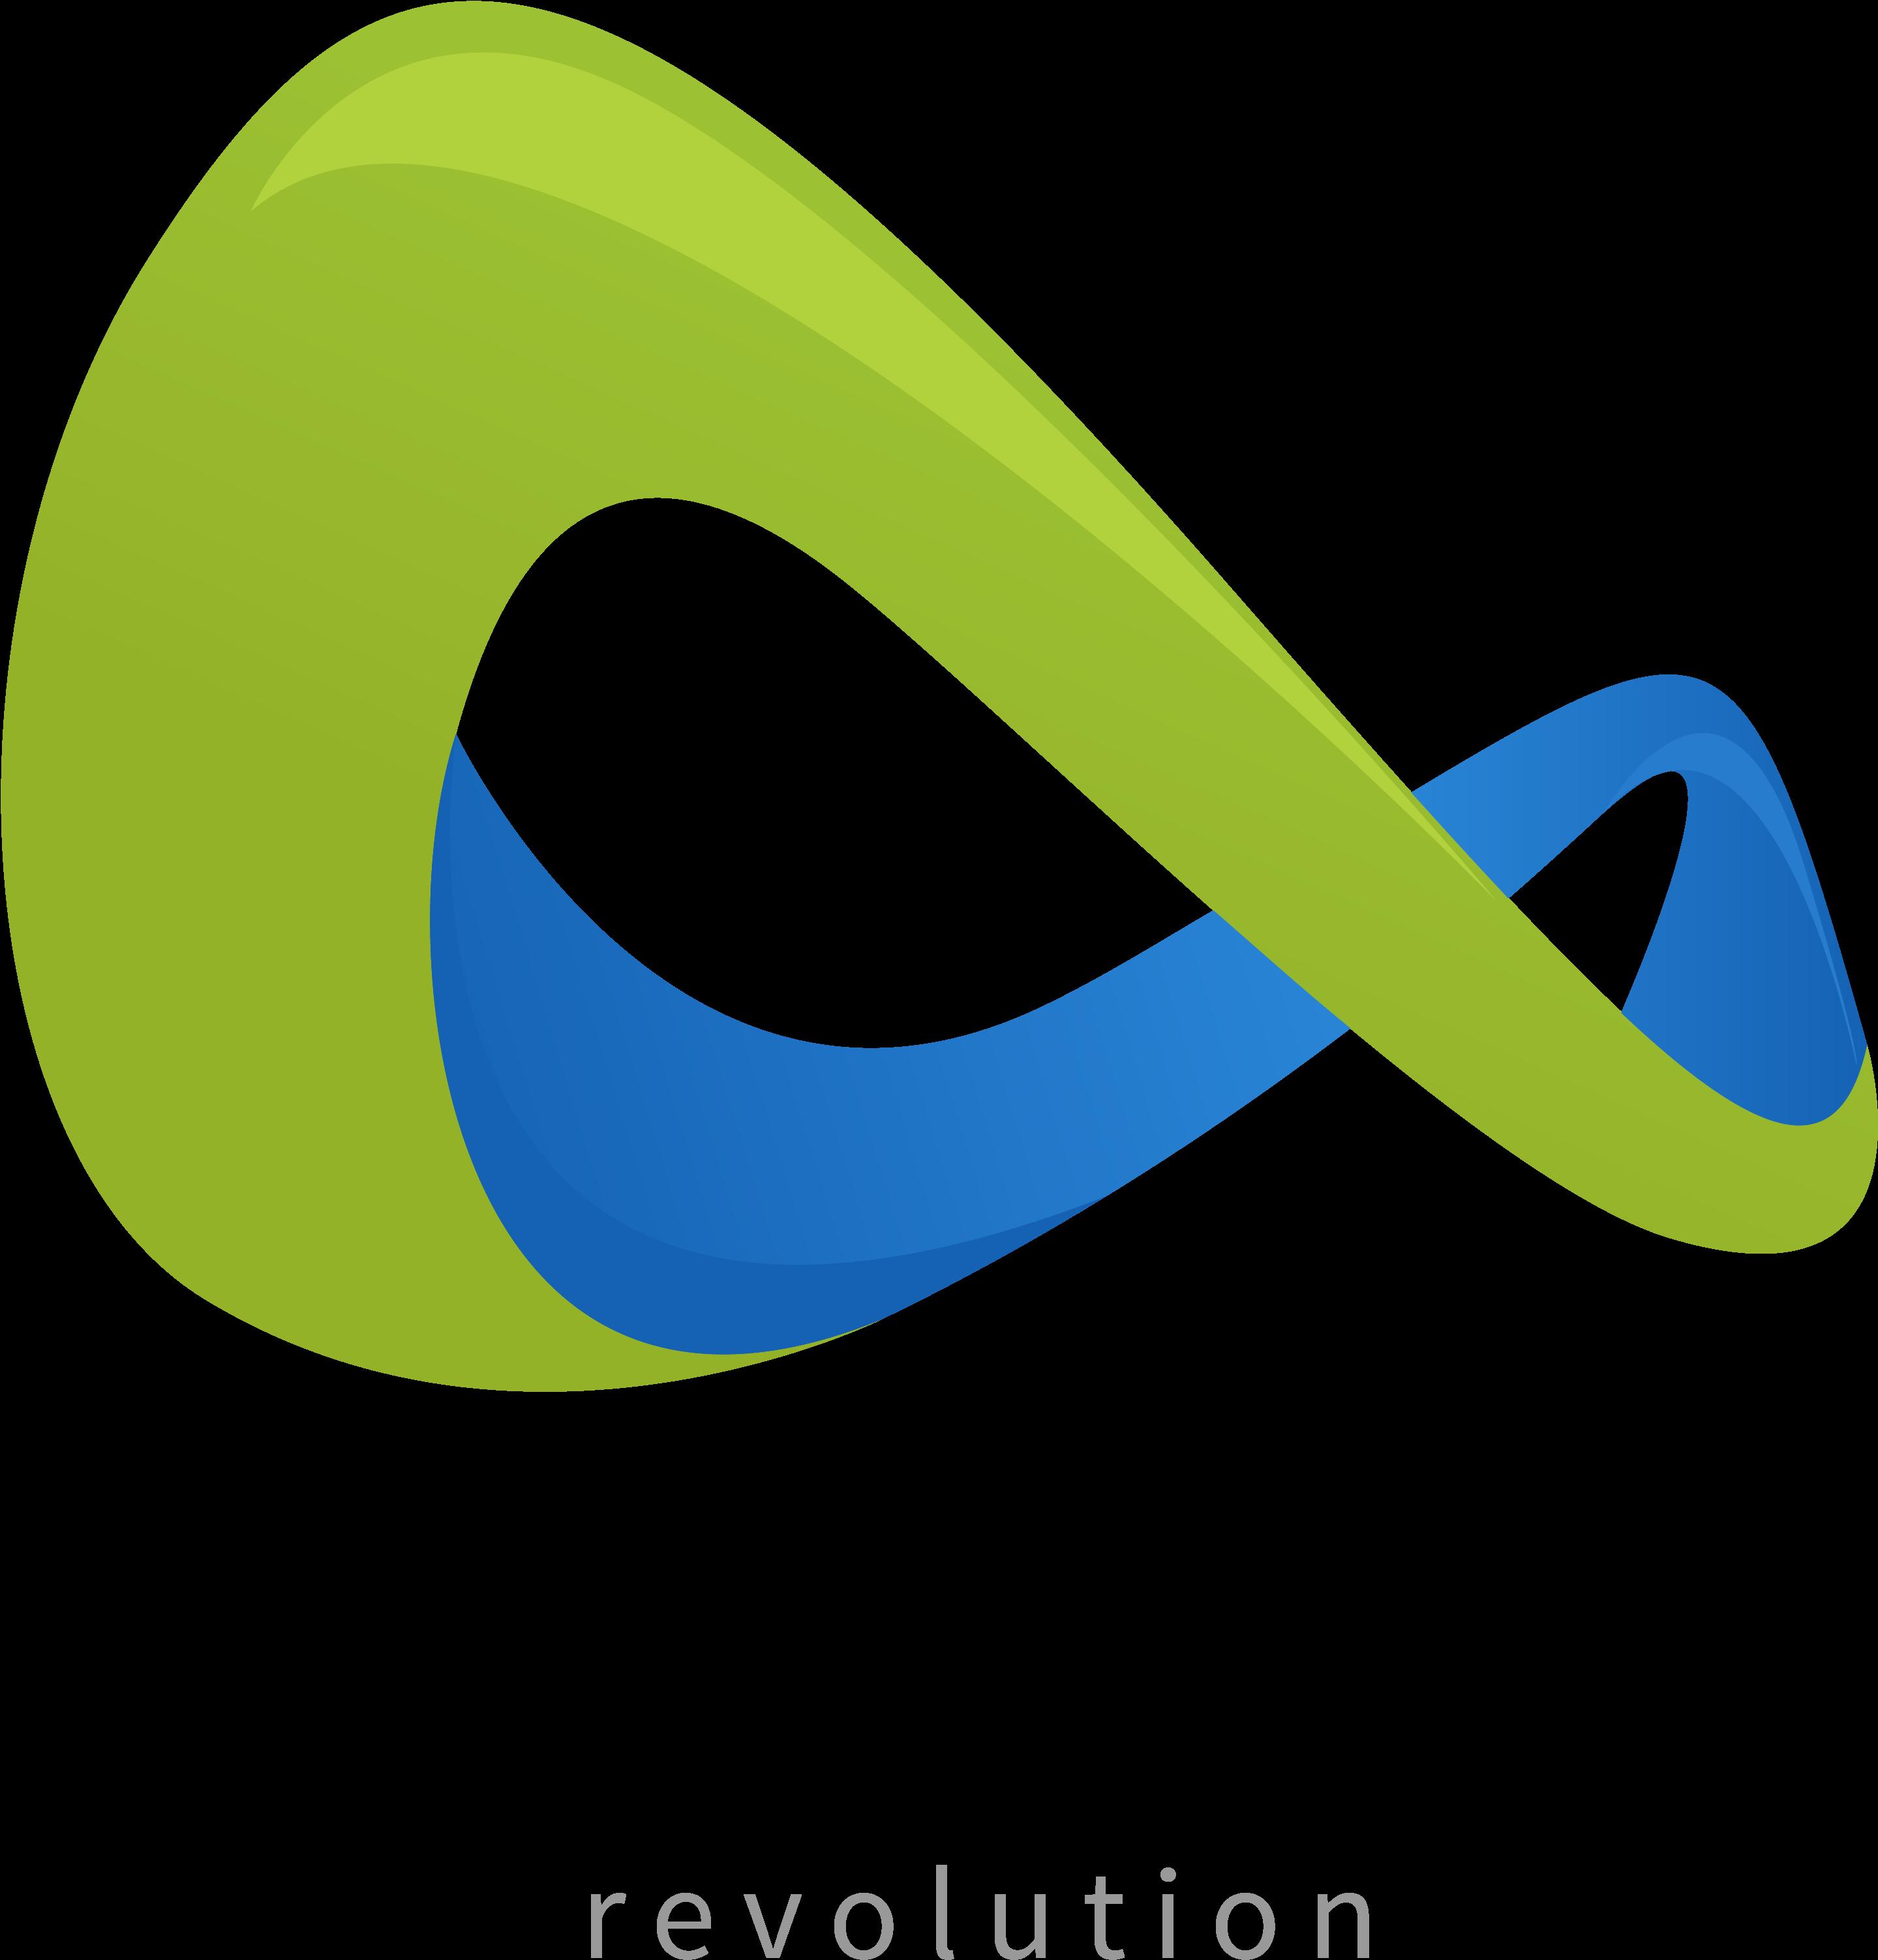 Download Infinity Logo Free Vector Download.